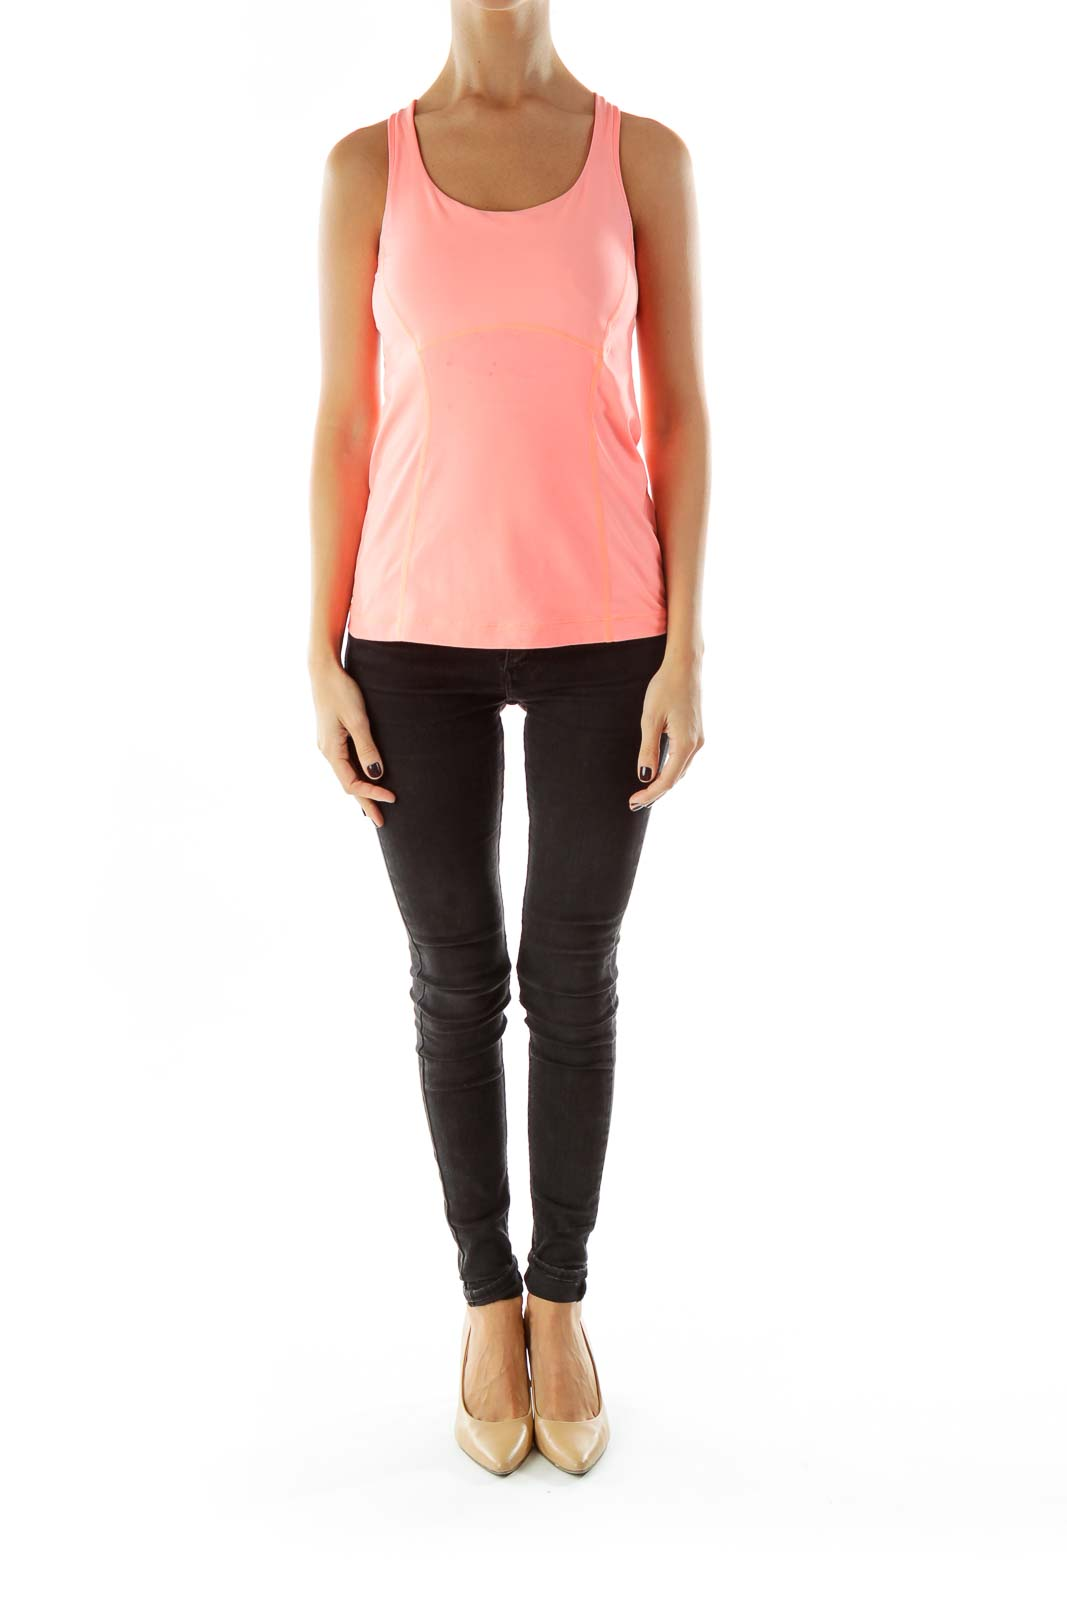 Pink Yoga Top